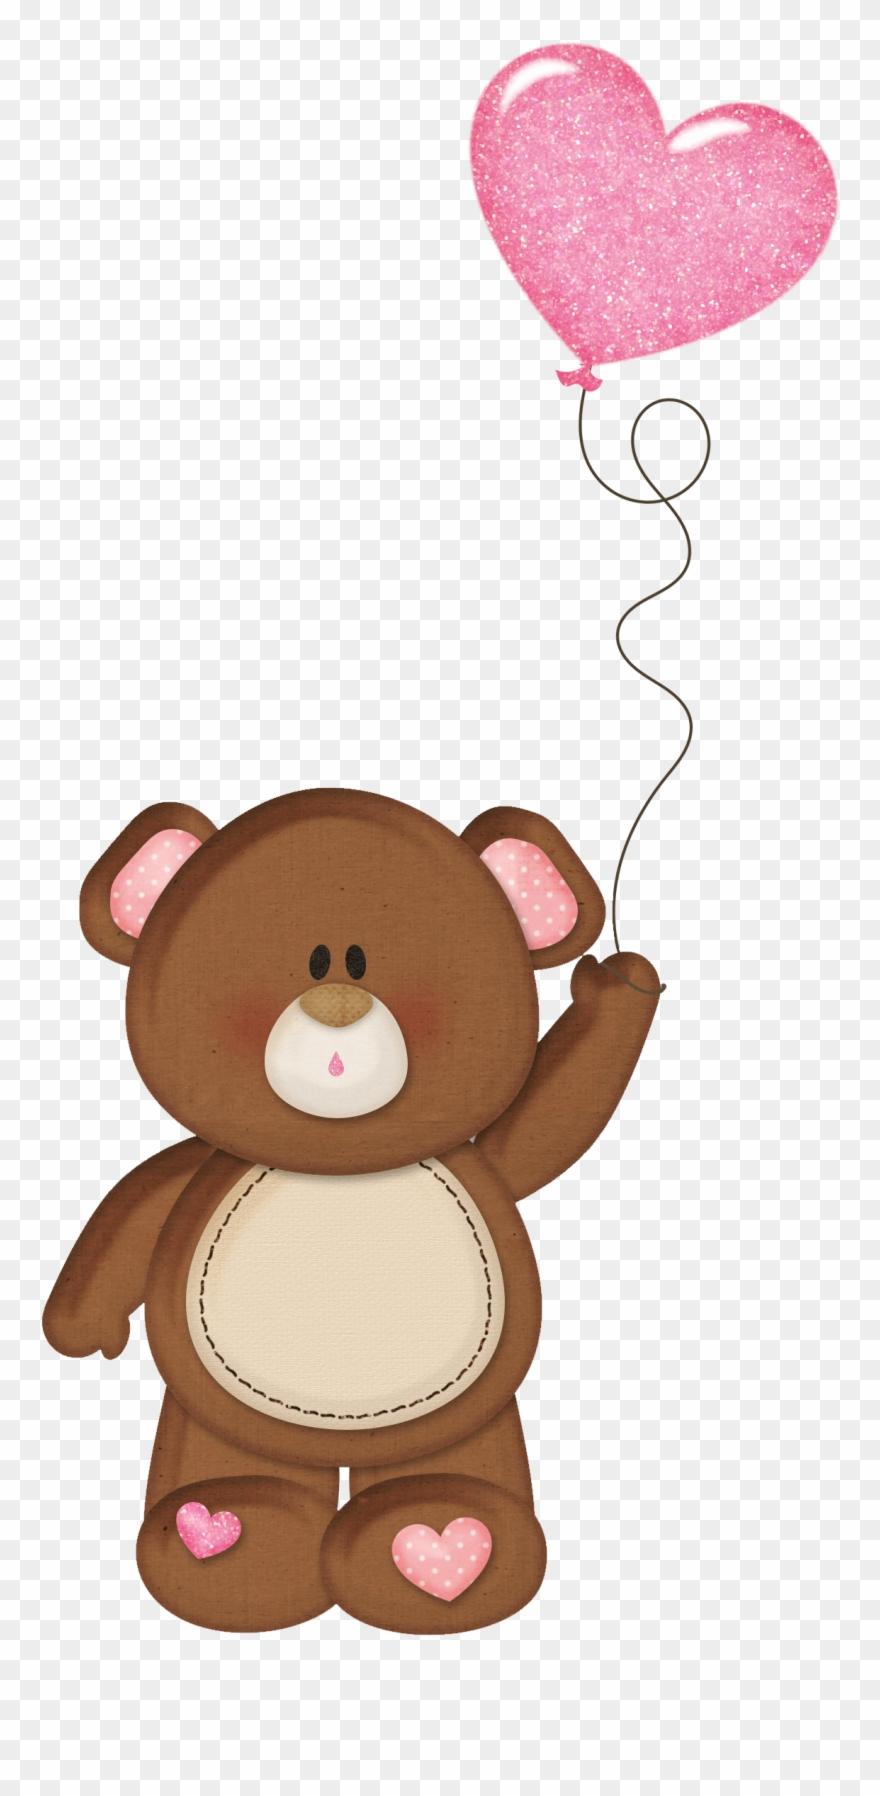 Pin By Lynn On Clip Art Teddy Bears.